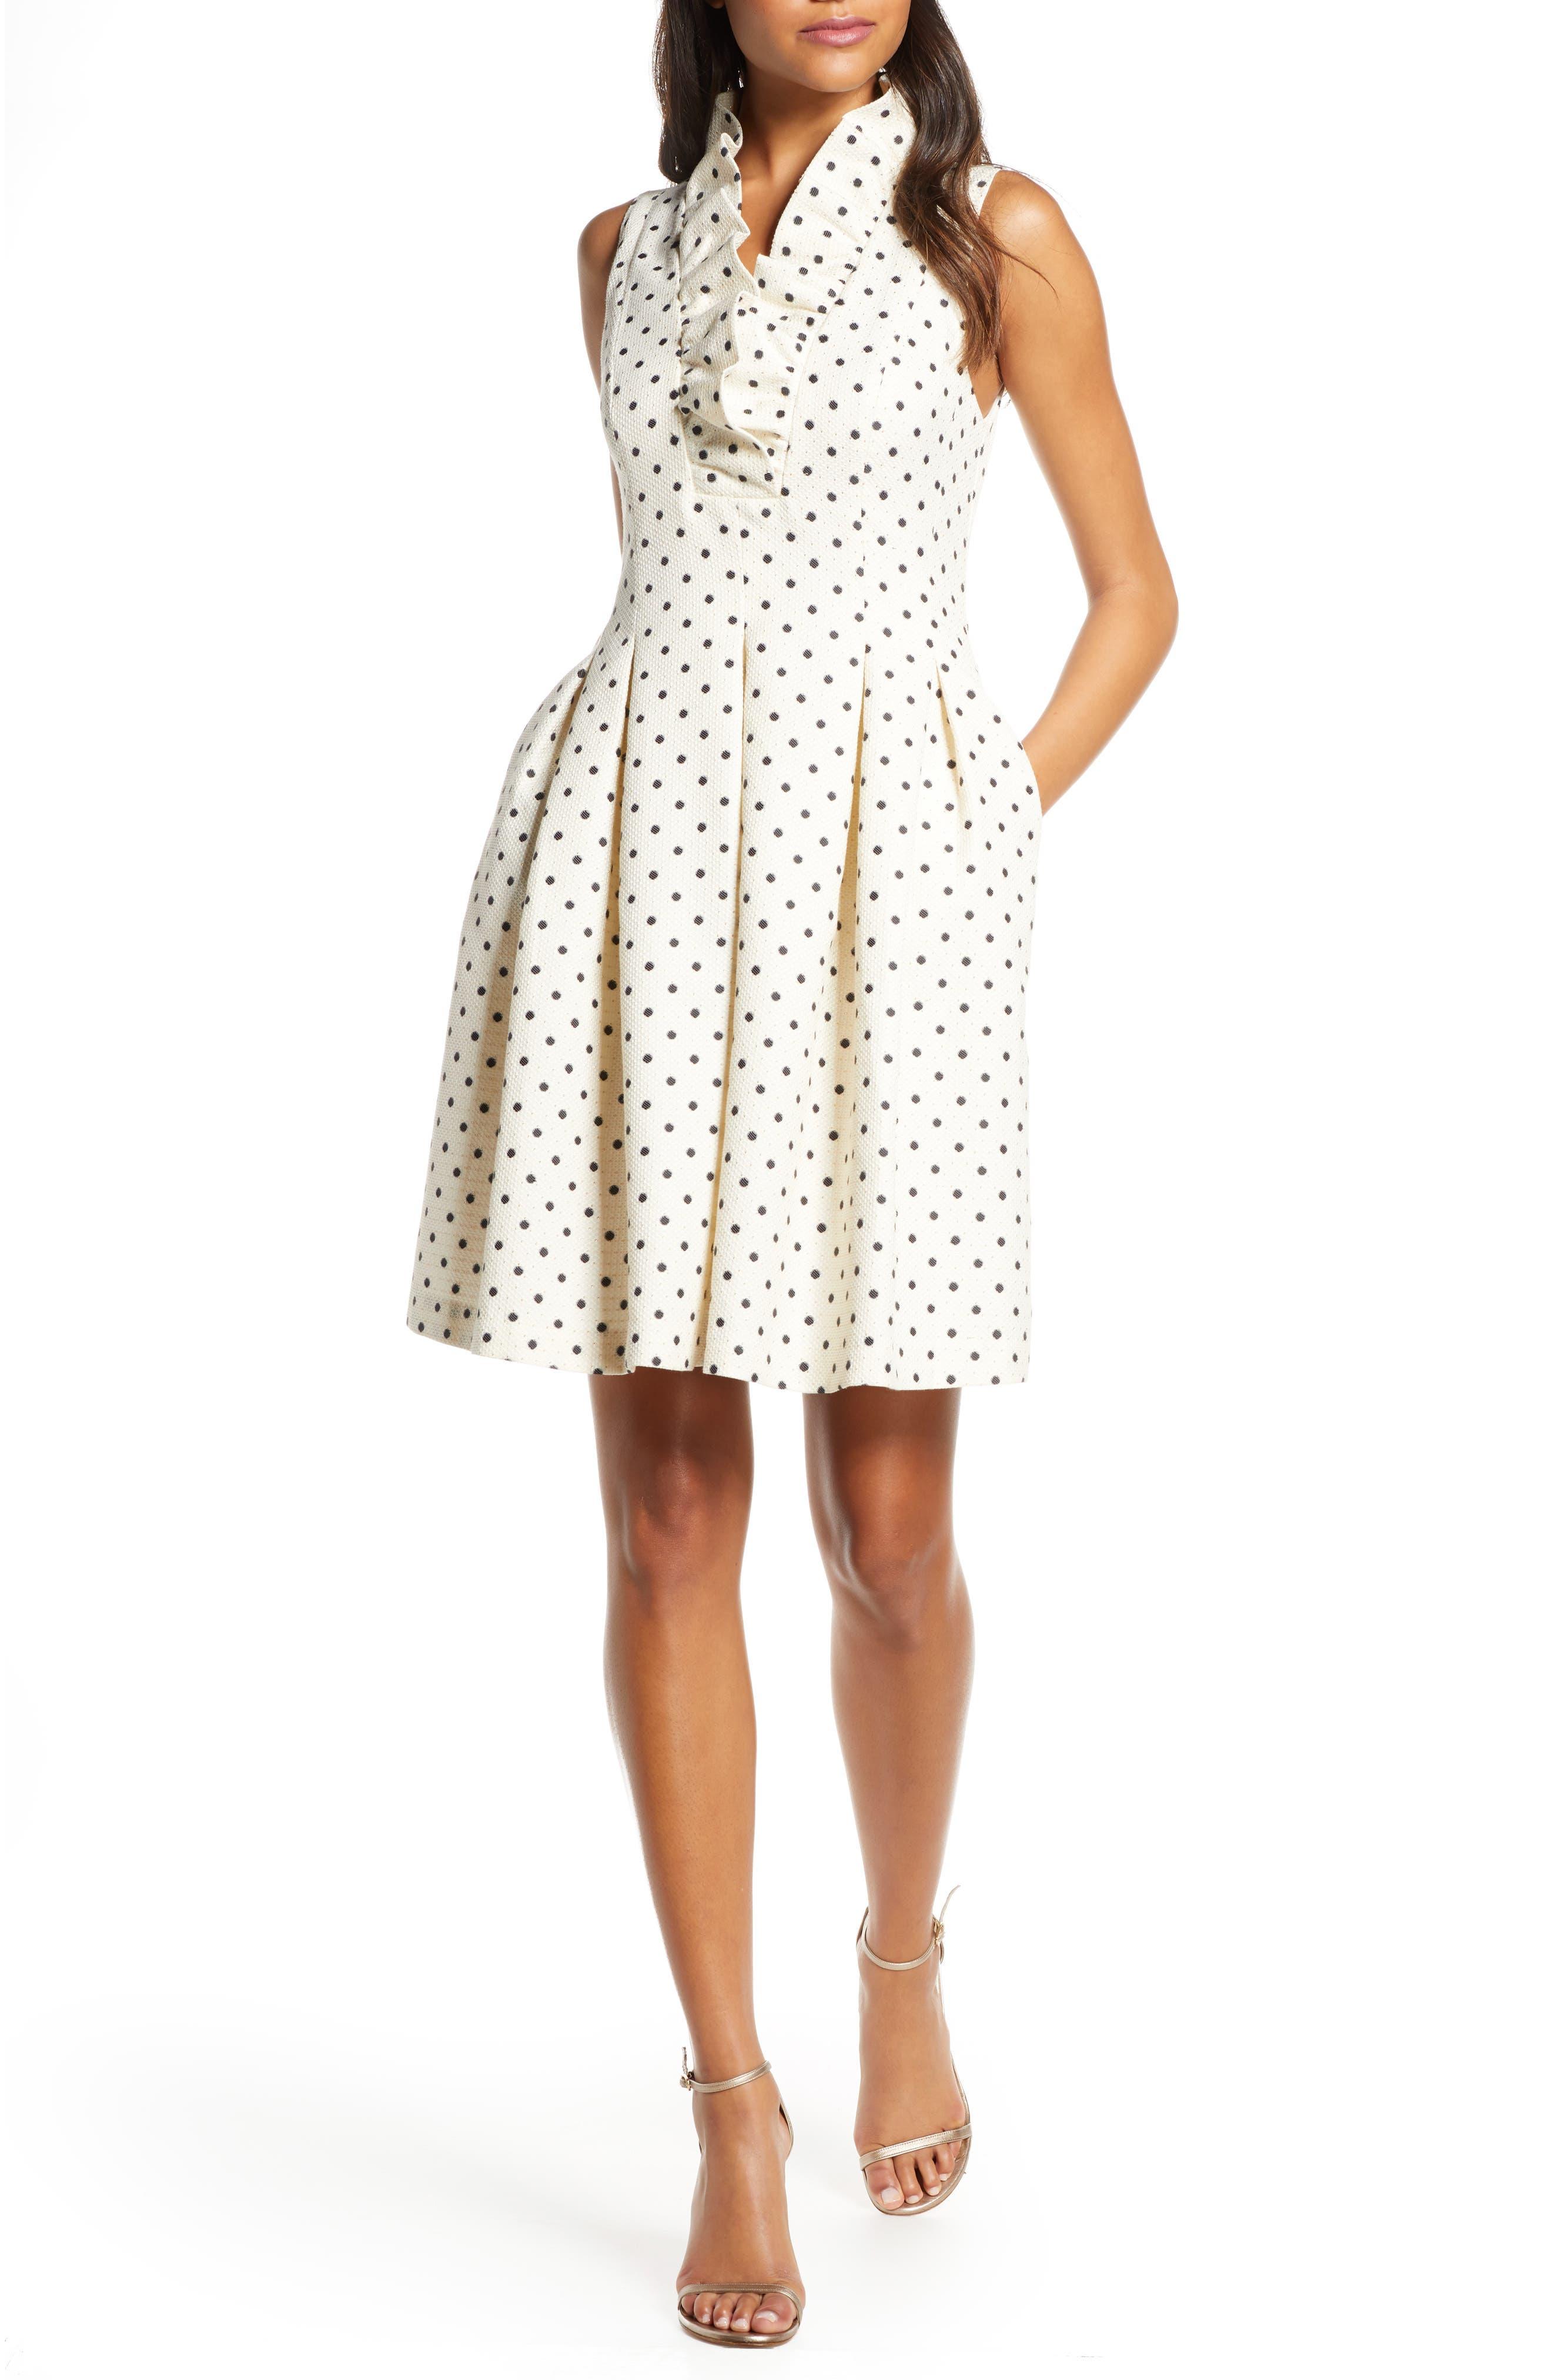 Petite Harper Rose Metallic Polka Dot Fit & Flare Dress, Ivory